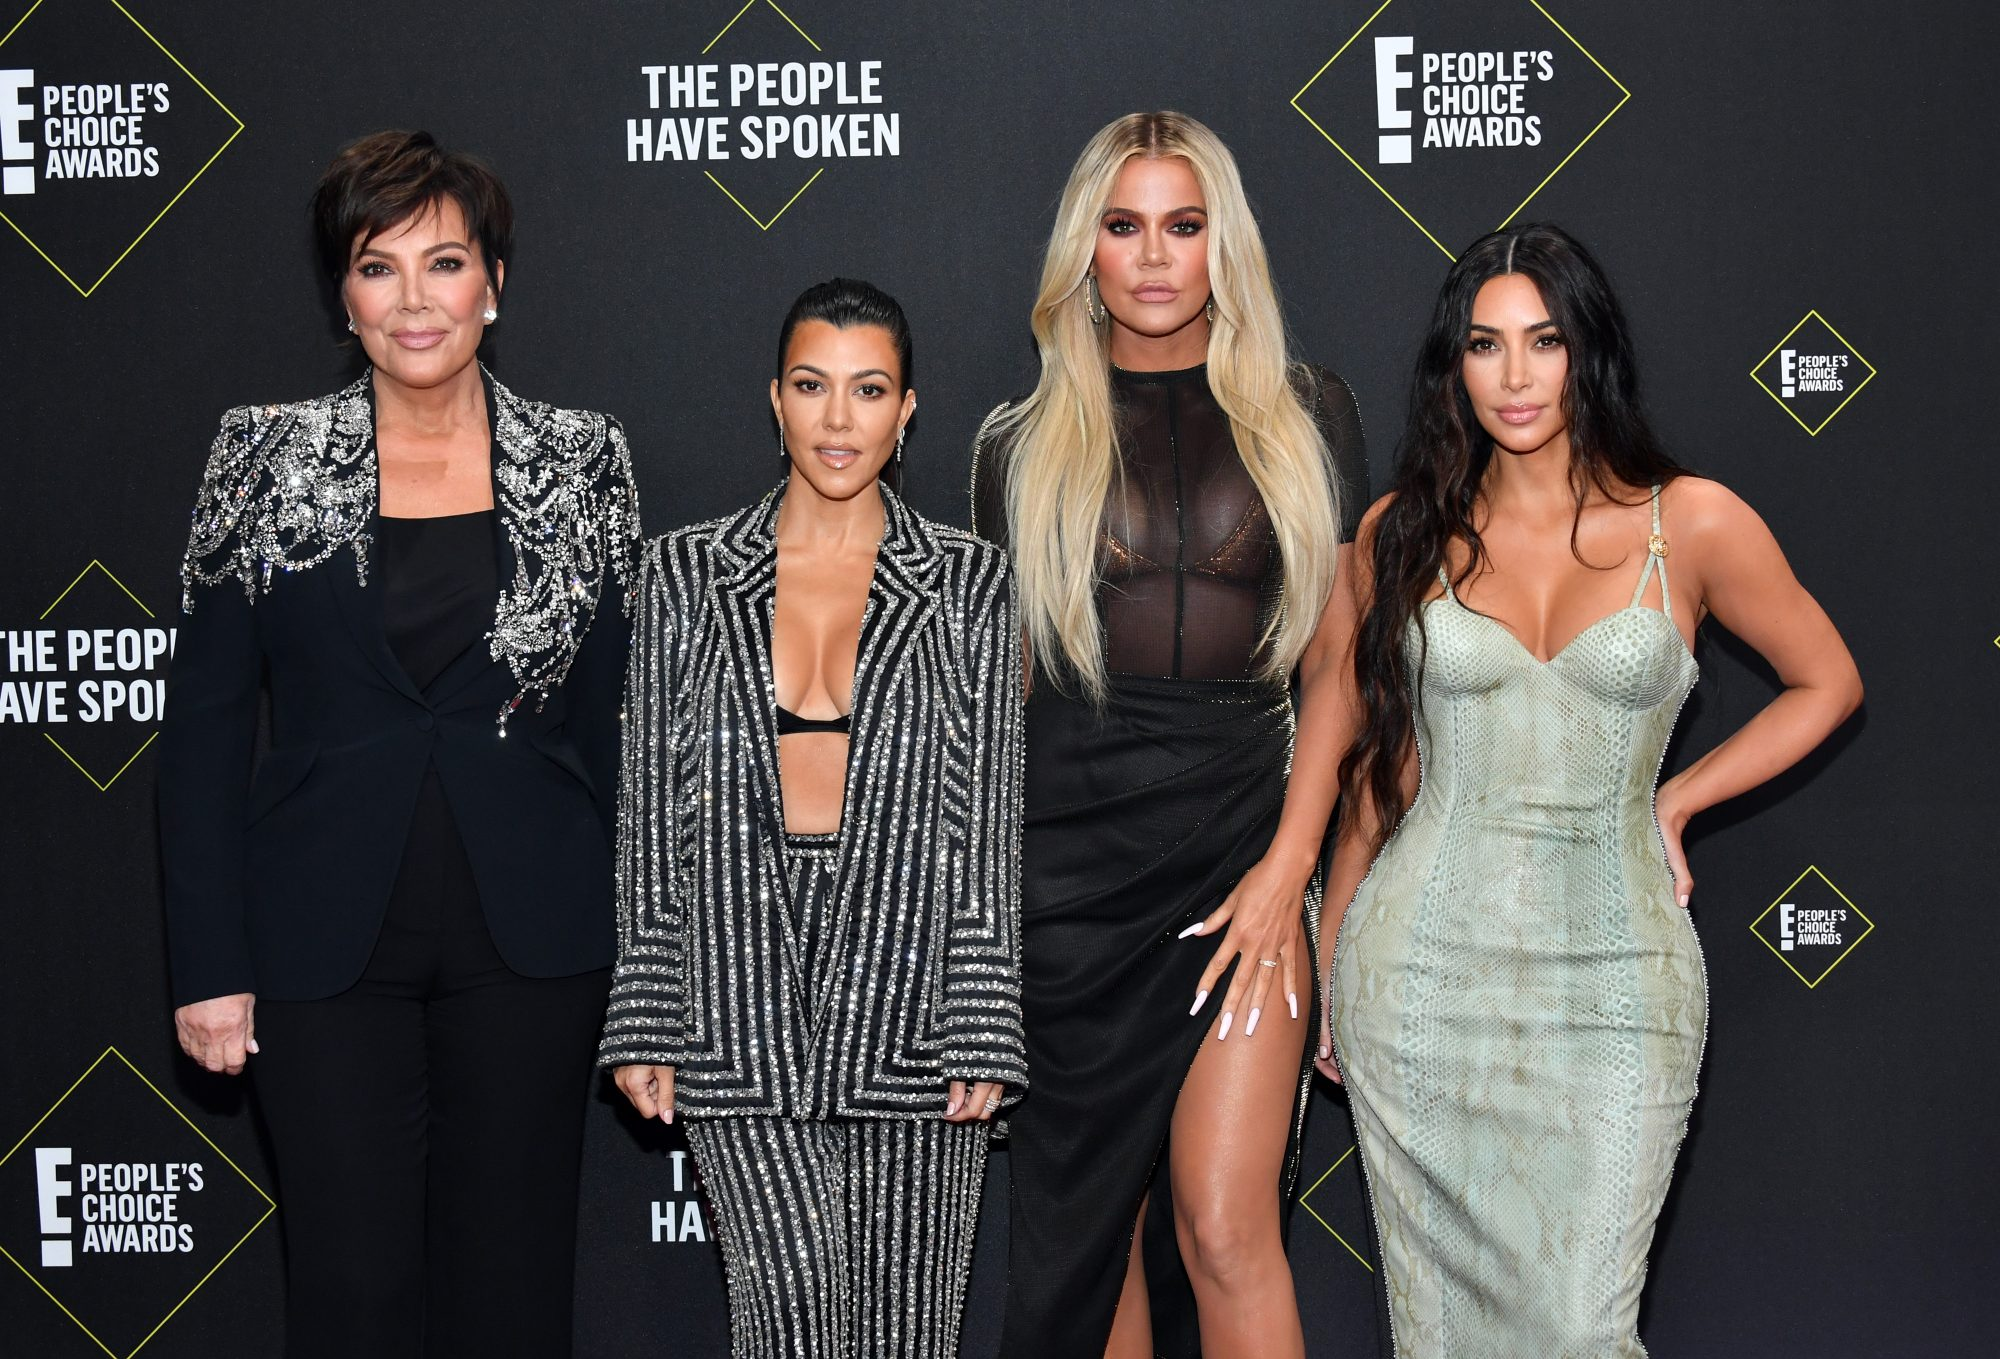 Kris Jenner, Kourtney Kardashian, Khloé Kardashian, Kim Kardashian West, People's Choice Awards